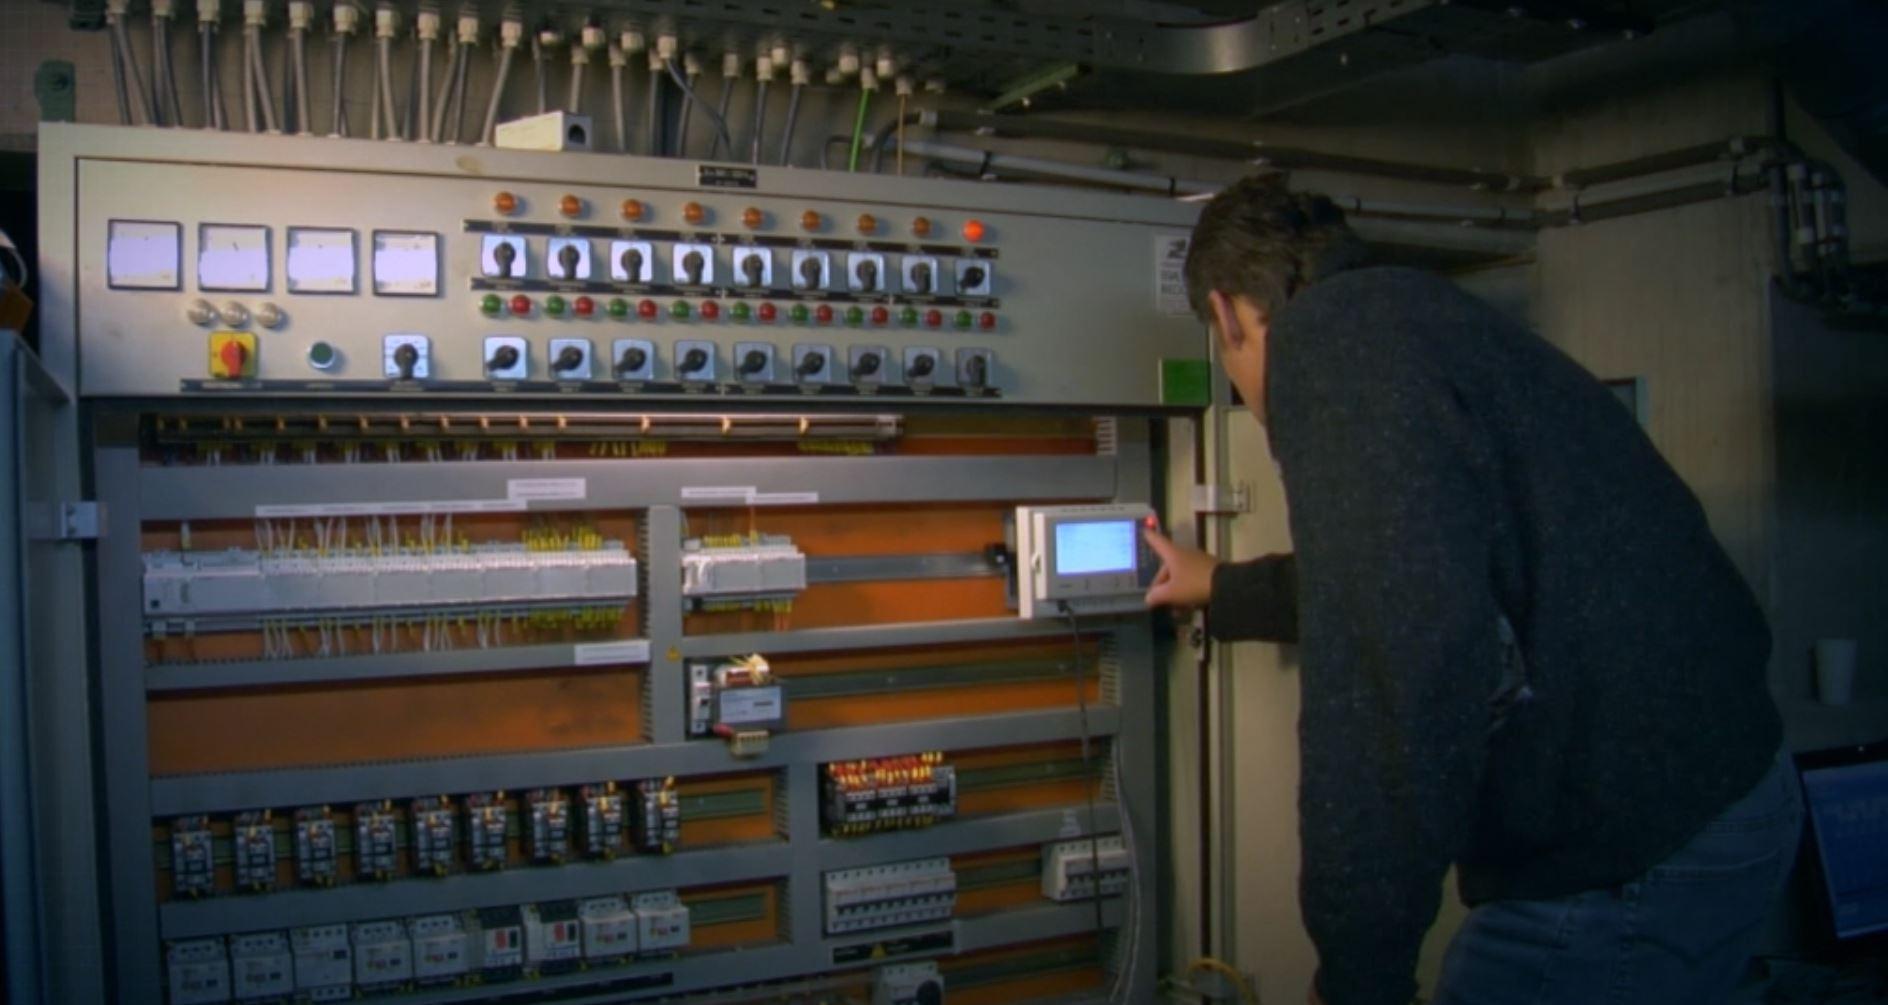 Onderhoud & Service HVAC-regeling